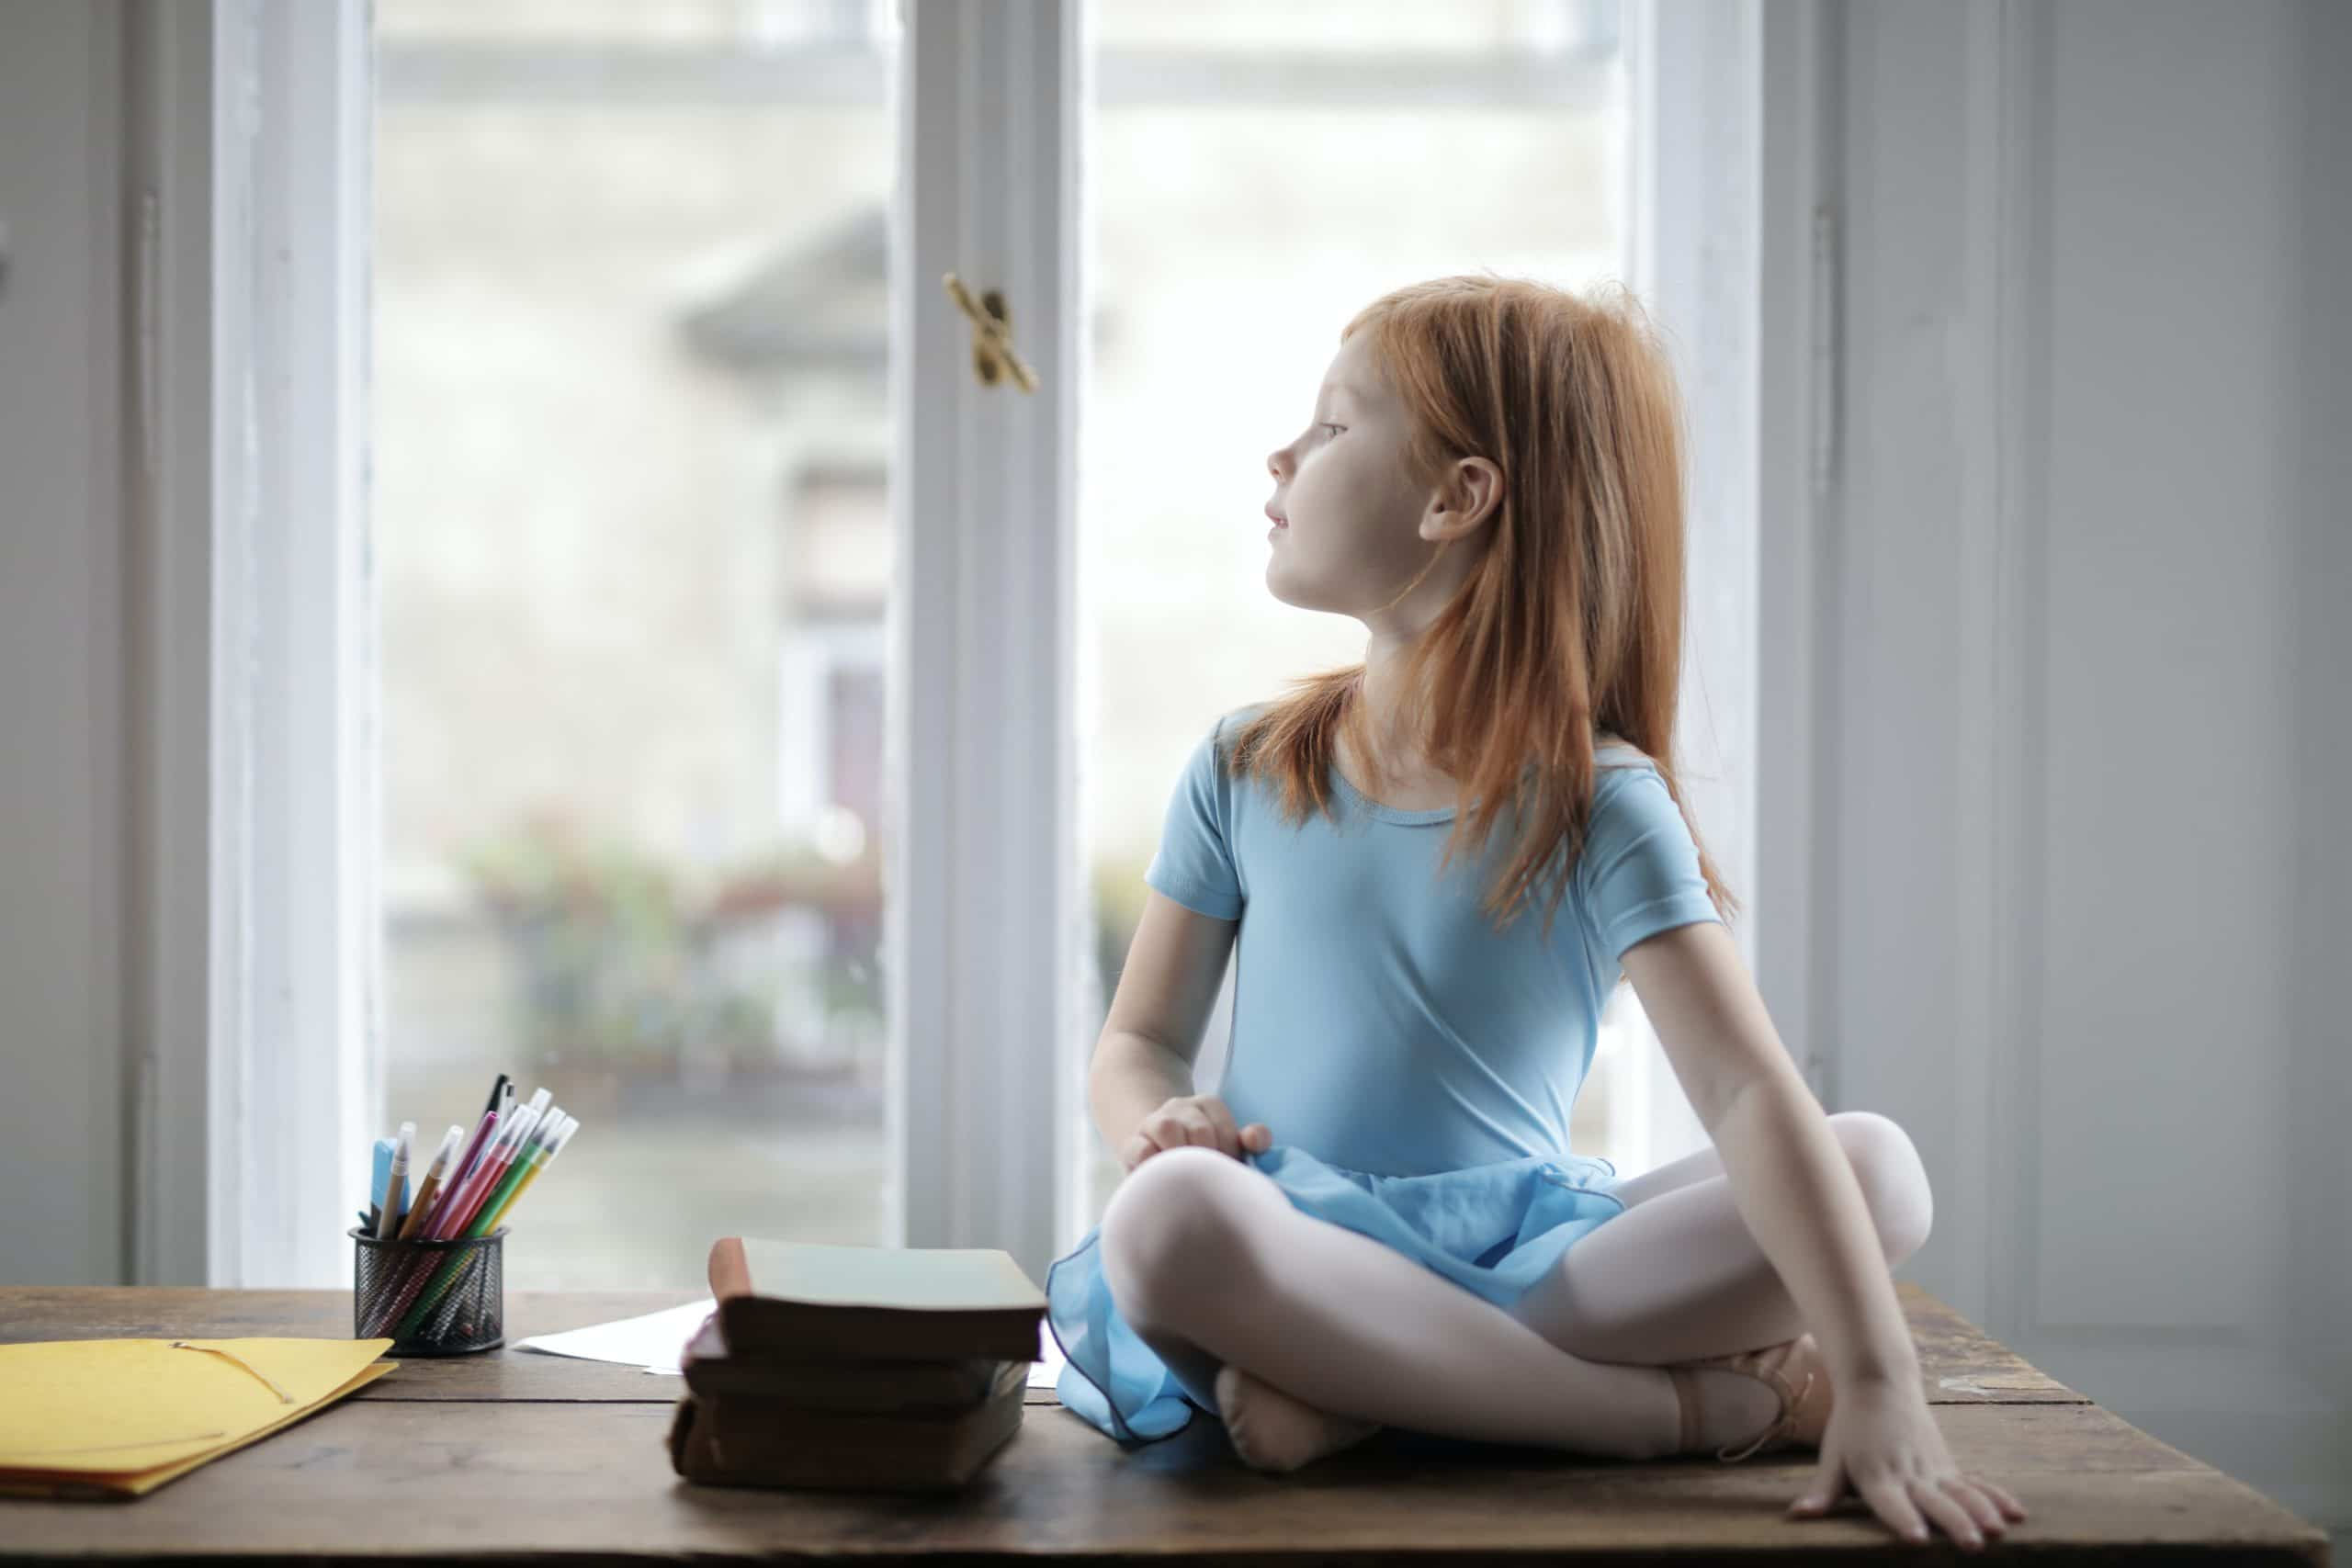 adorable-little-girl-in-ballet-dress-sitting-on-table-3887537